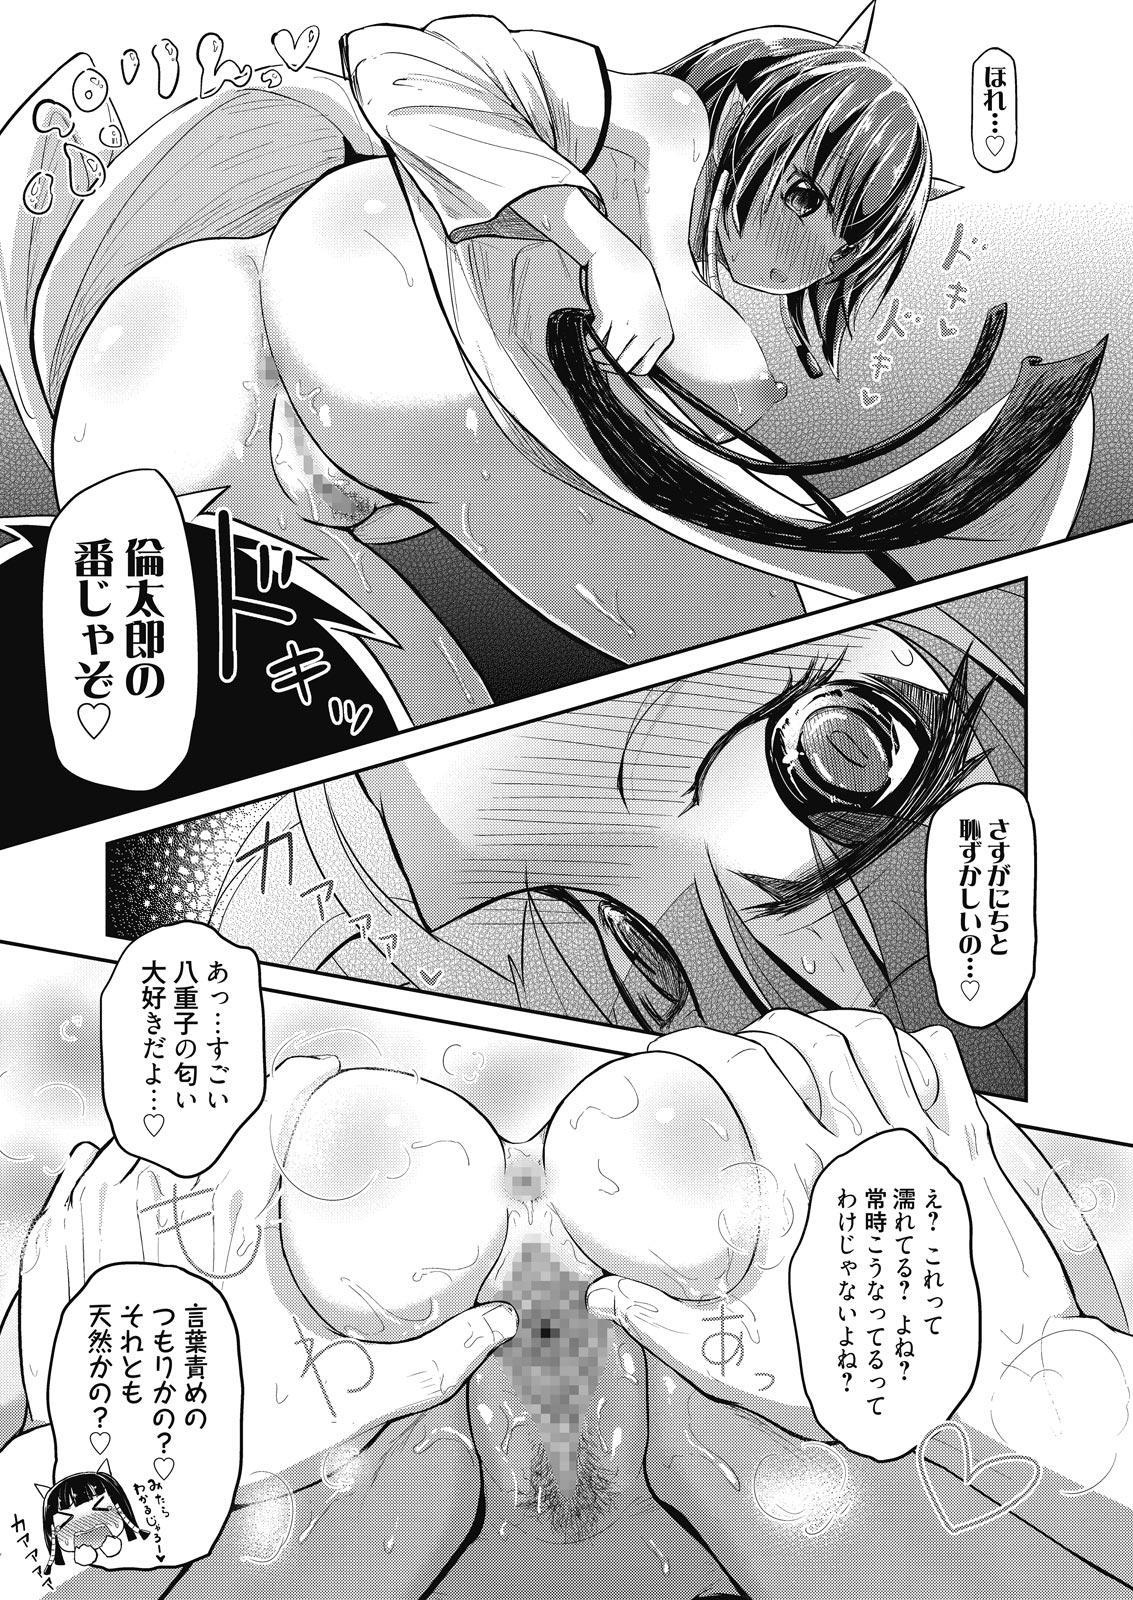 Web Manga Bangaichi Vol. 7 124